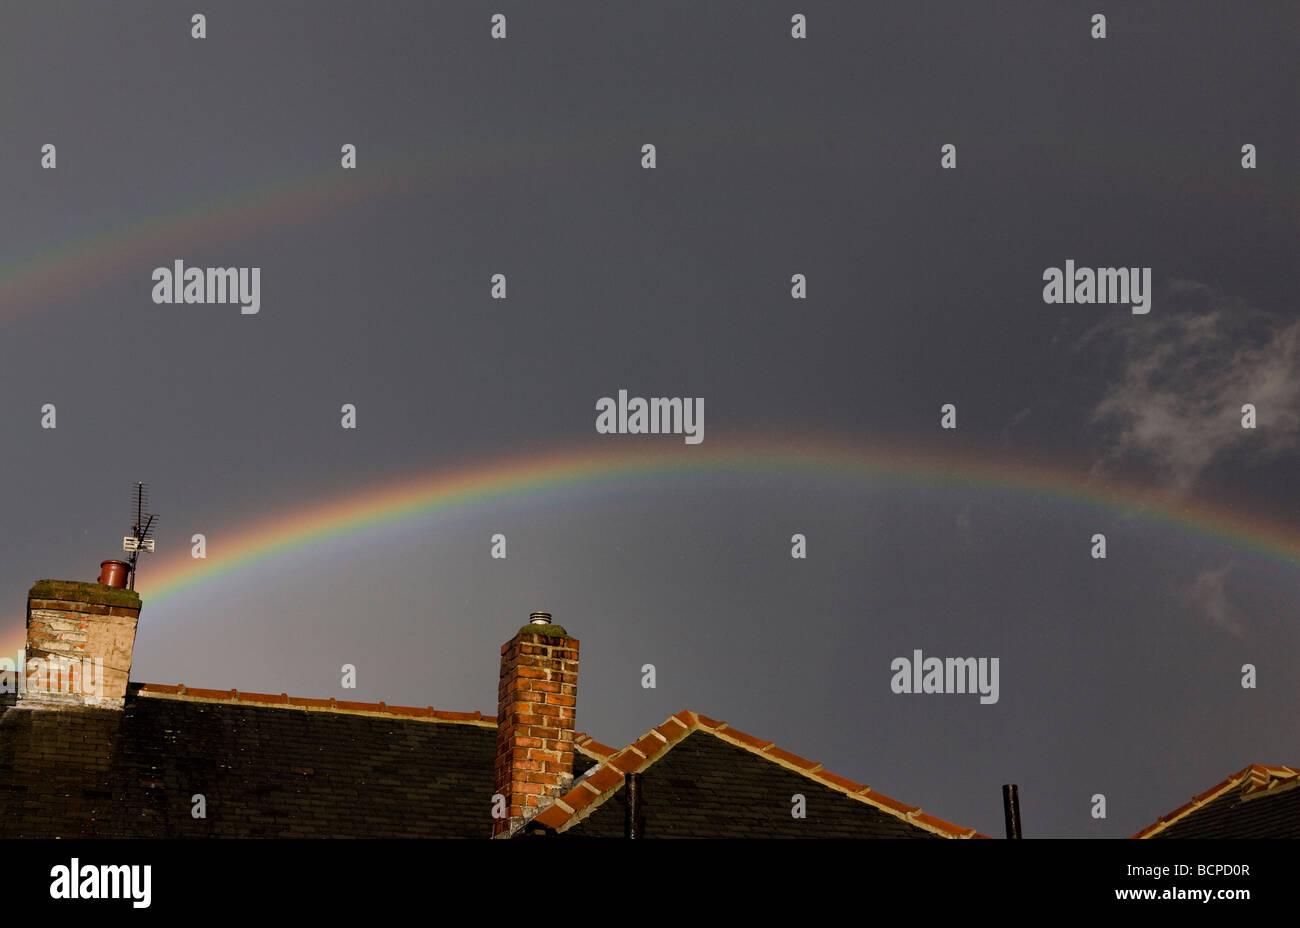 Double rainbow showing Alexandar's dark band between the arcs - Stock Image